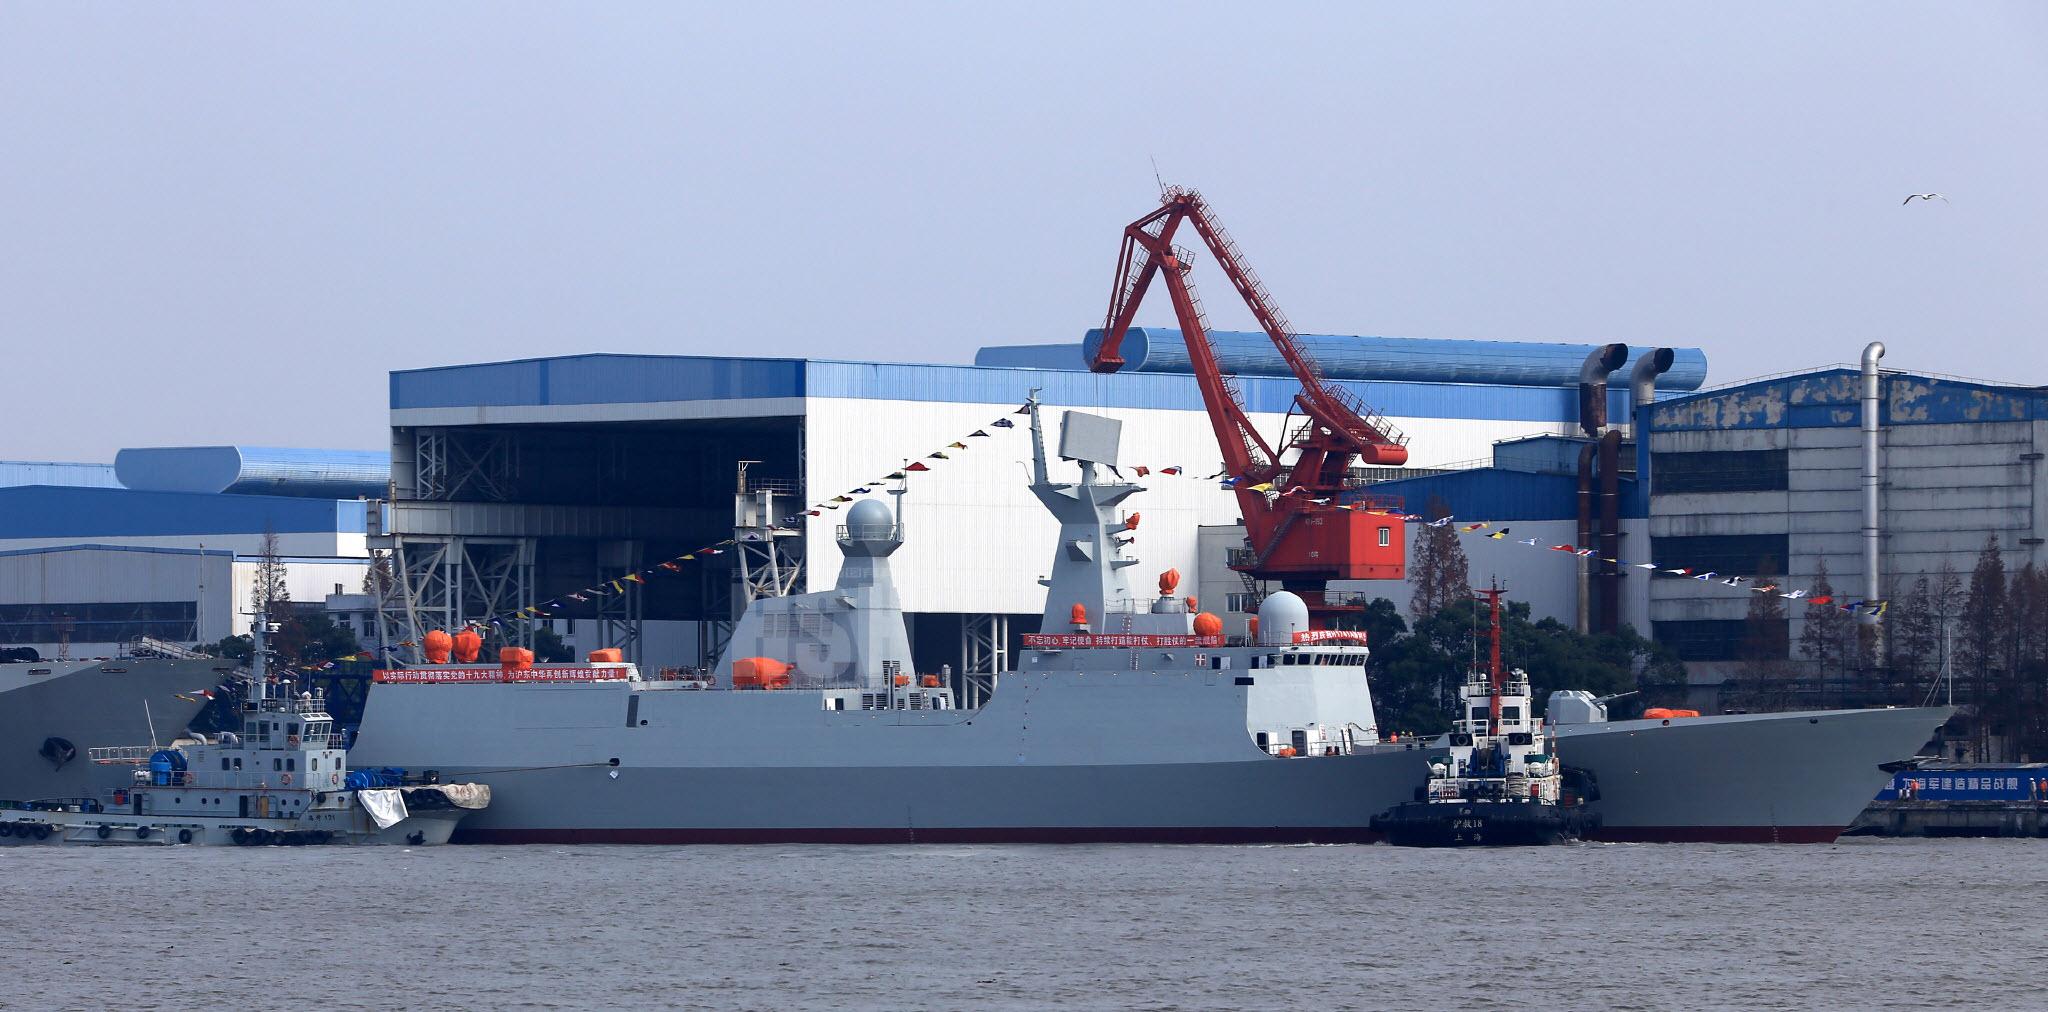 29-й по счету фрегат проекта 054А, строящийся для ВМС НОАК и спущенный на воду 16.12.2017 на китайском судостроительном предприятии Hudong Shipyard объединения Hudong-Zhonghua Shipbuilding Group в Шанхае.